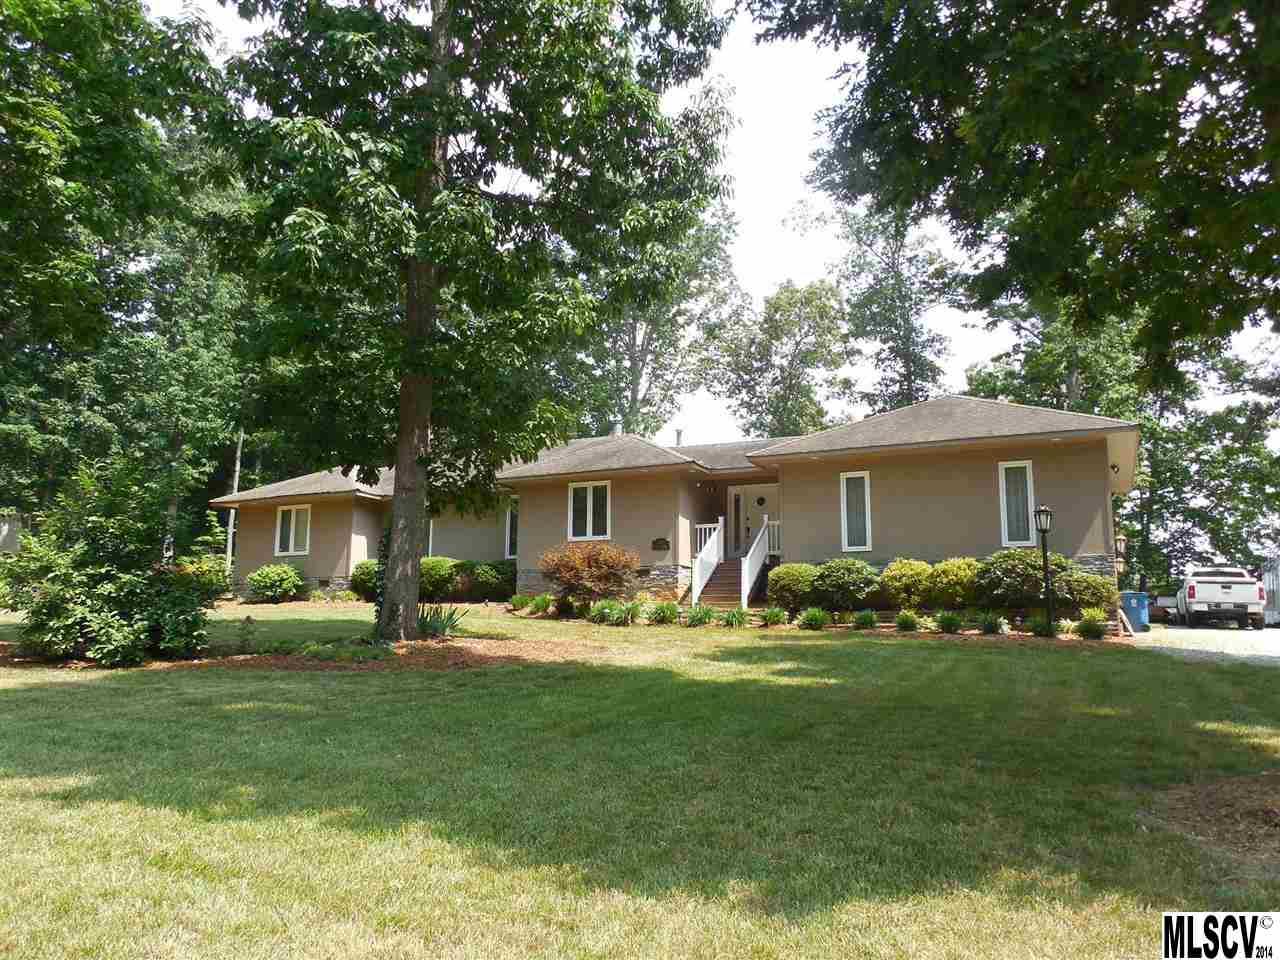 Real Estate for Sale, ListingId: 28388663, Claremont,NC28610